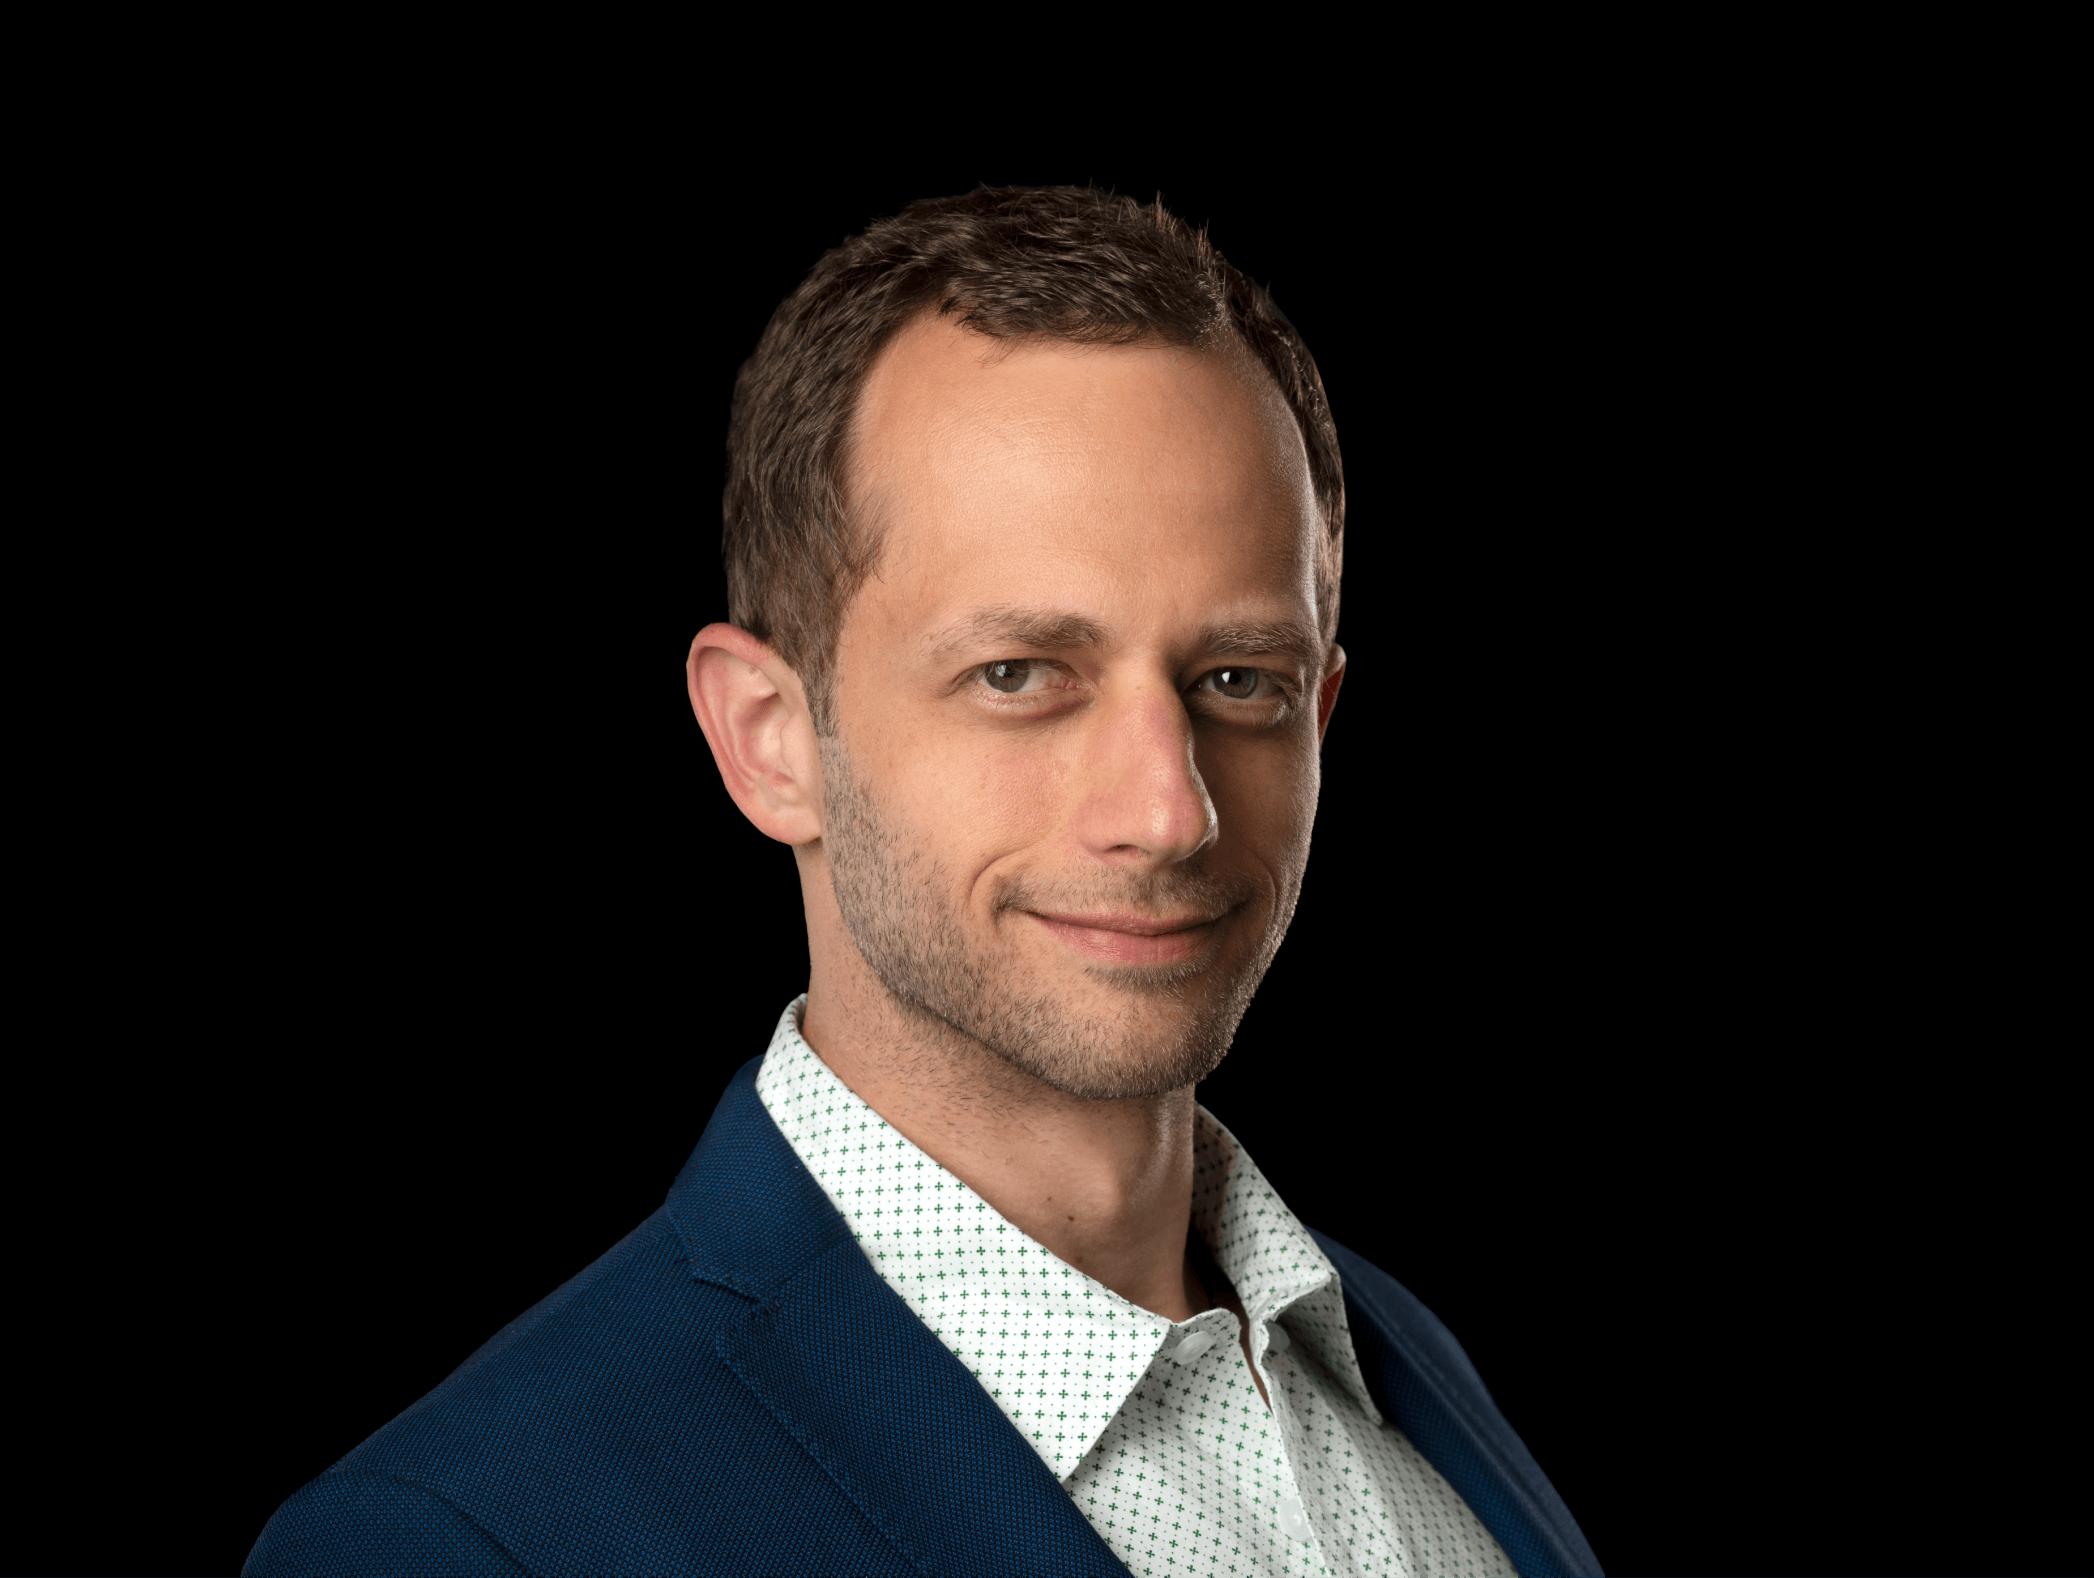 Author Dan Michaeli